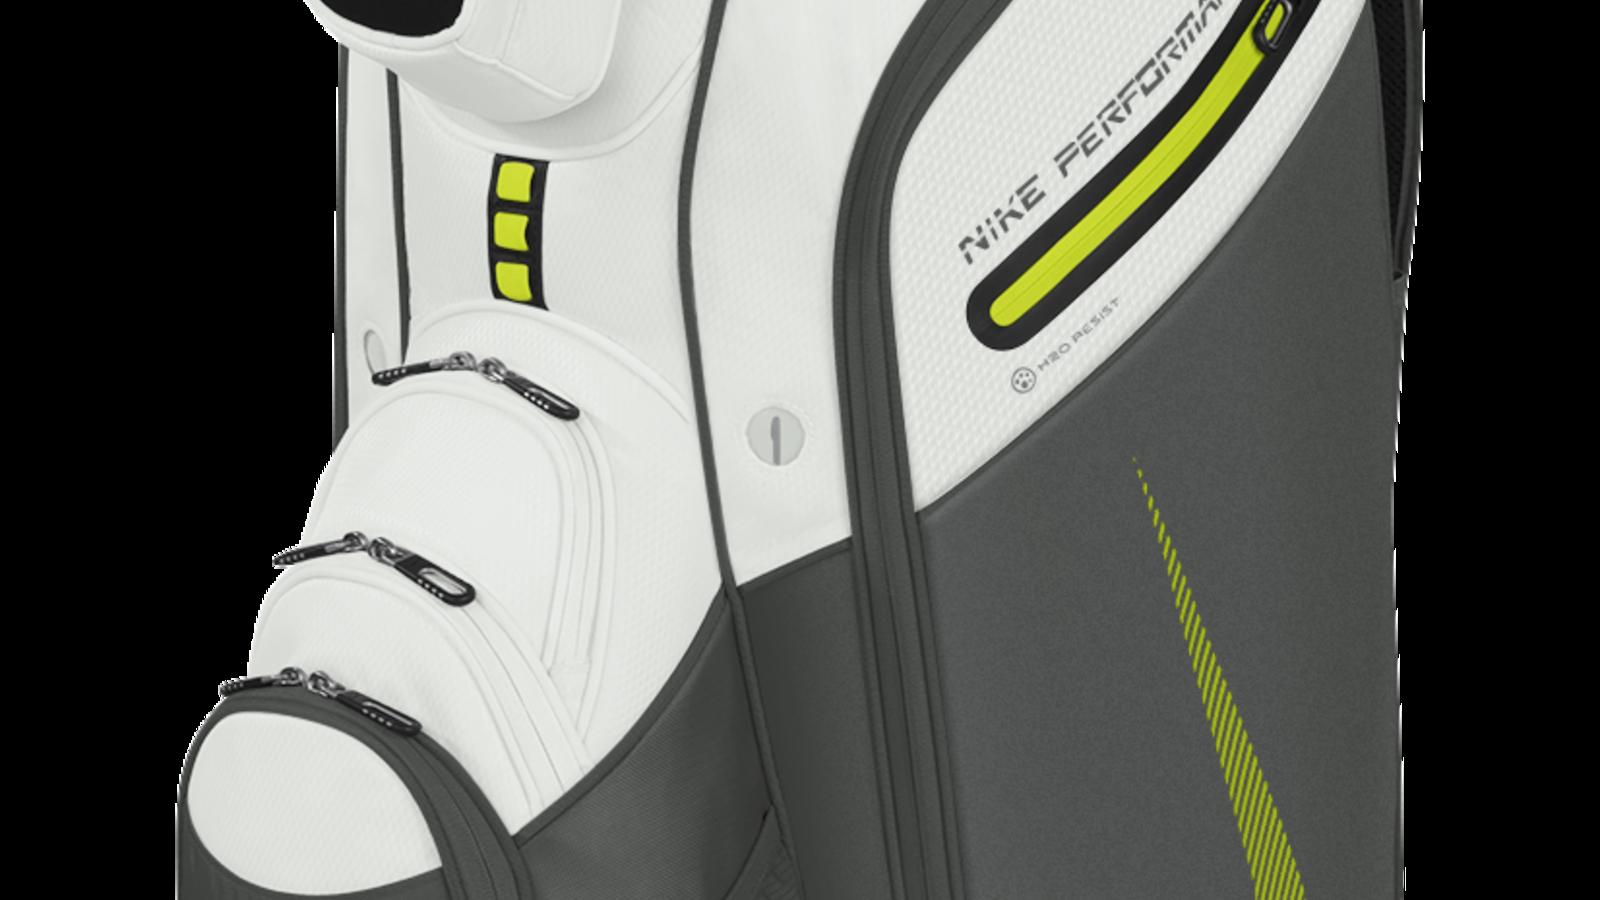 Nike Performance Cart Bag  Modern Design and Superior Storage - Nike ... 8baf69fa47e98